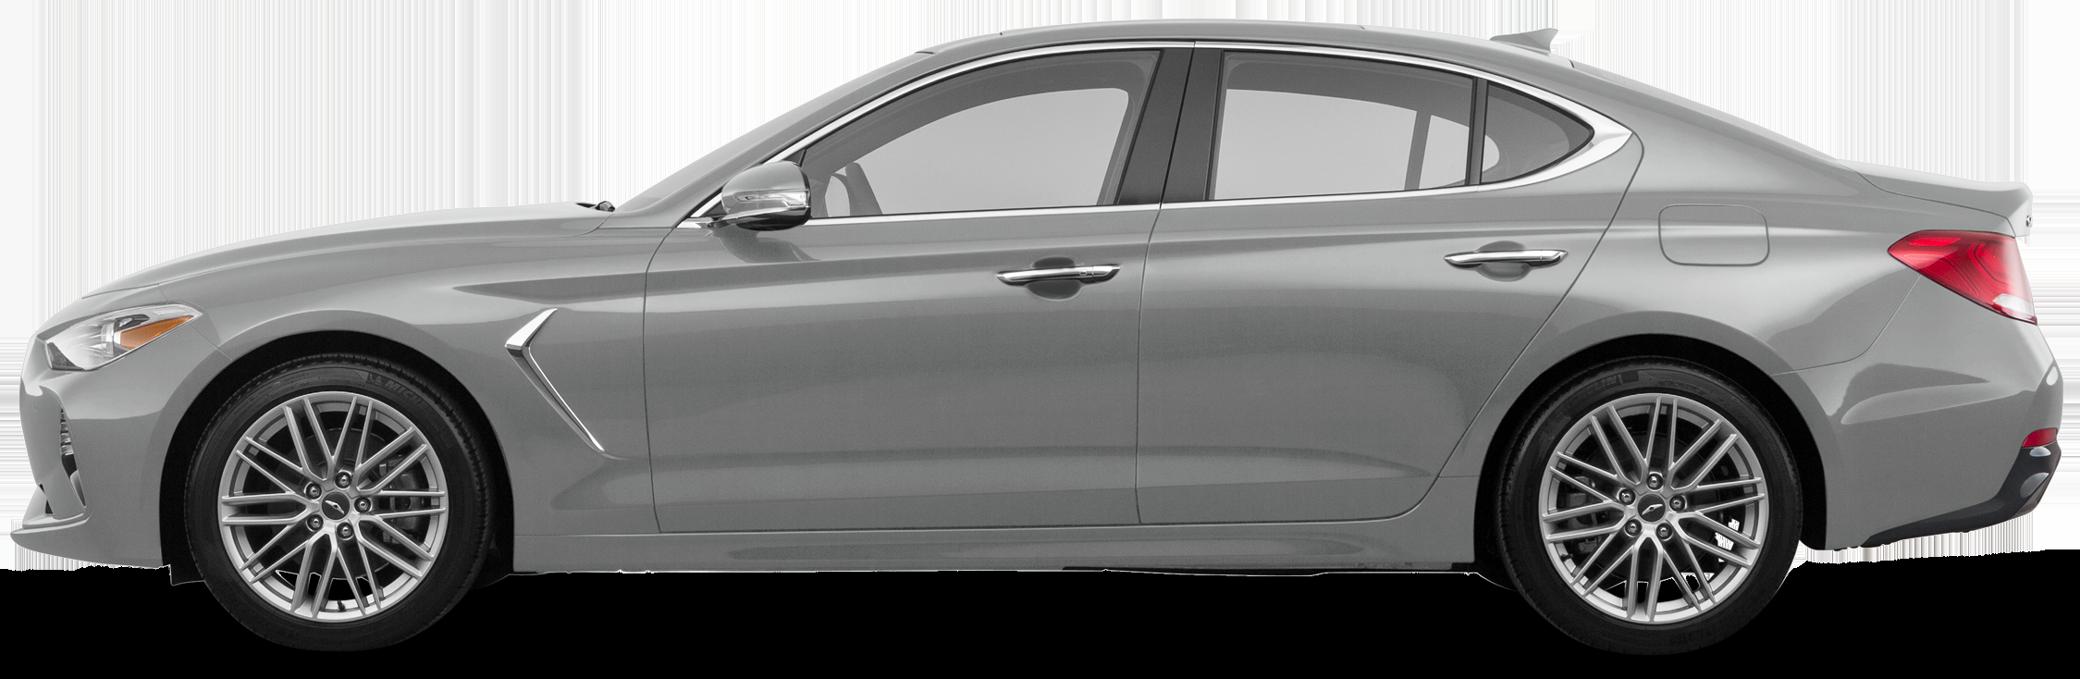 2021 Genesis G70 Sedan 2.0T Standard AWD